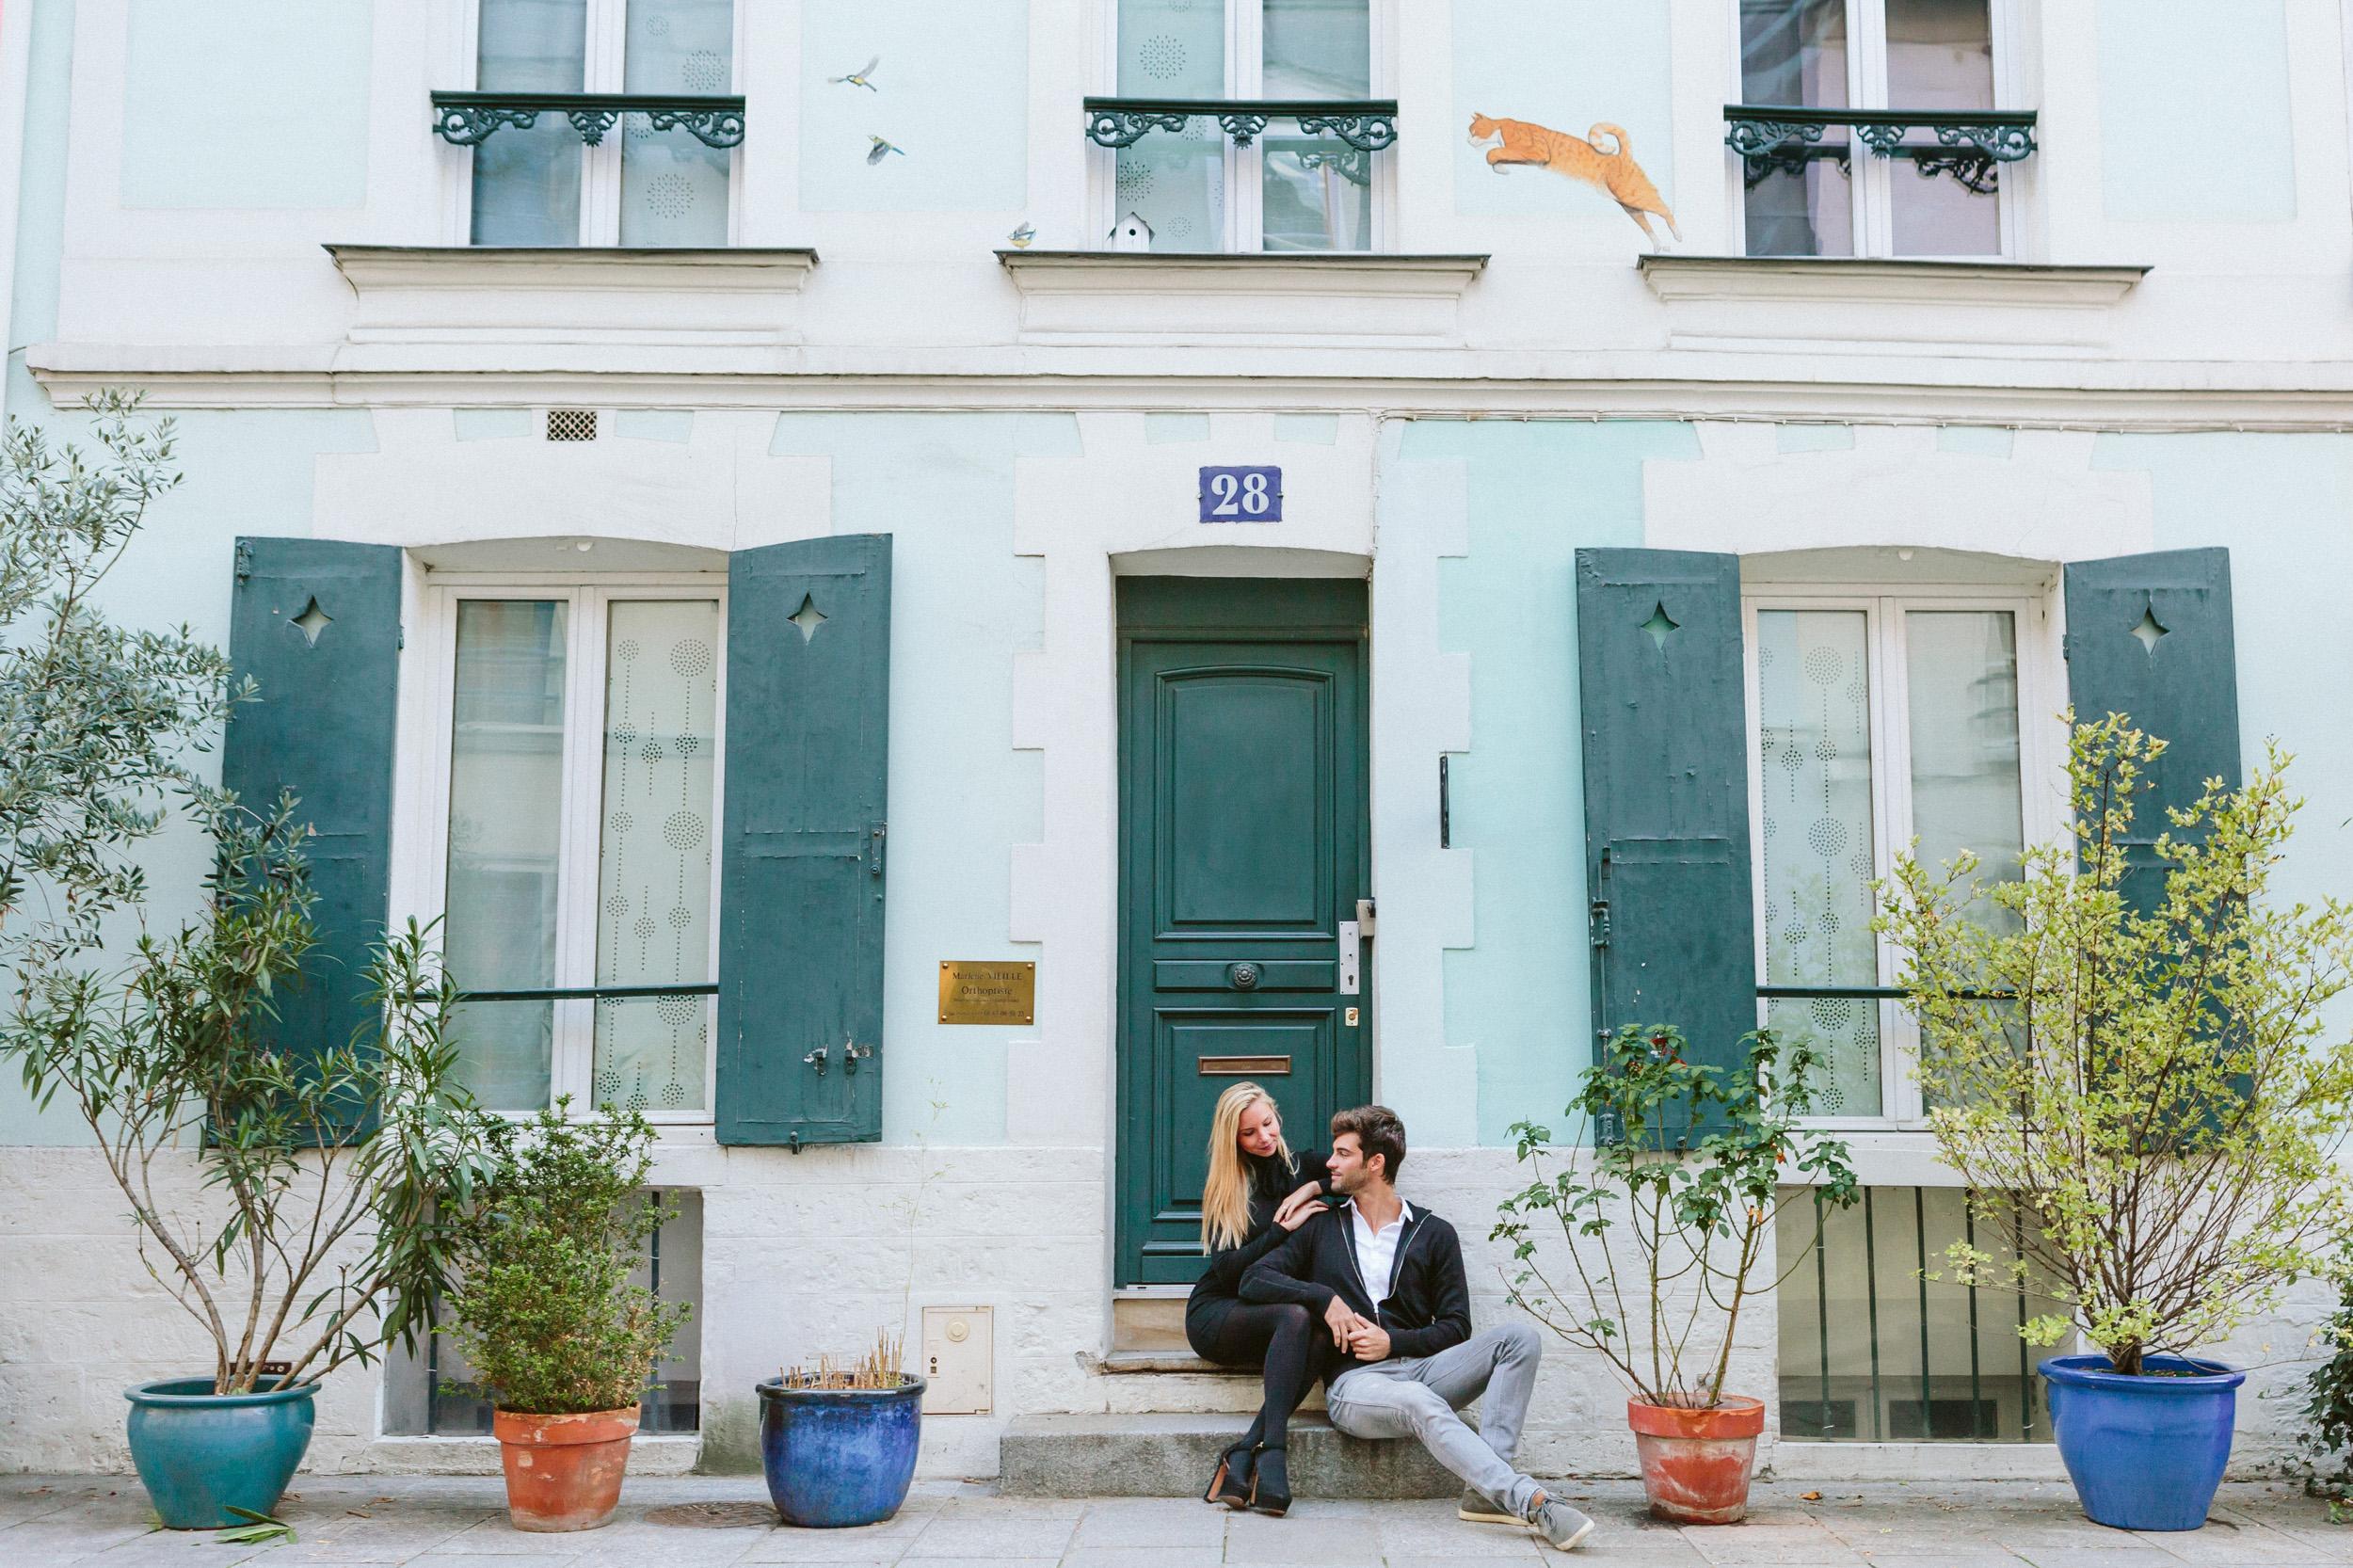 Paris Photographer Lovestory street rue cremieux